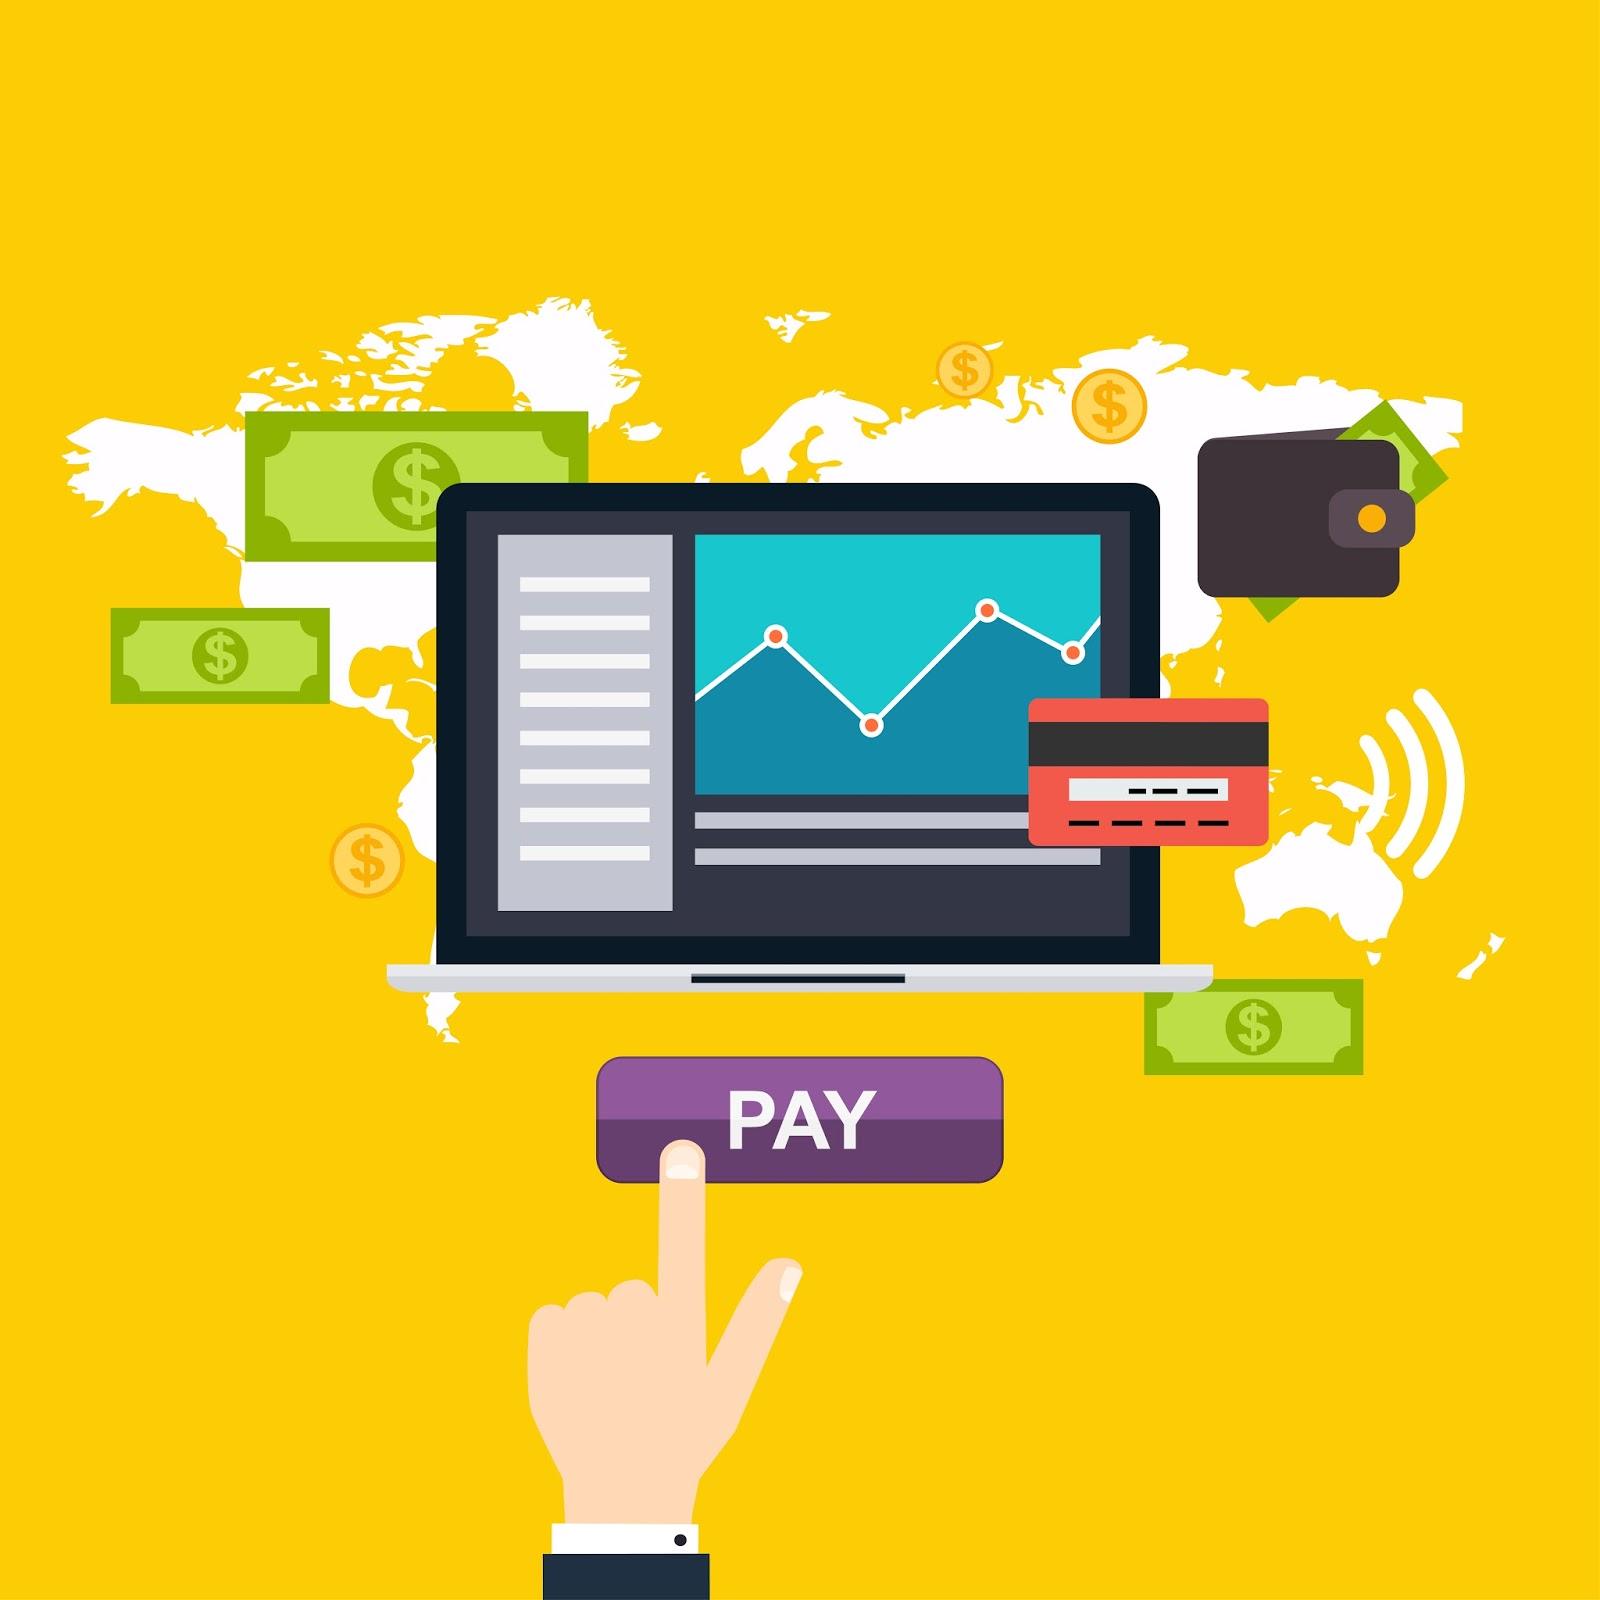 top websites listinternet news businessbest placestipsmarket